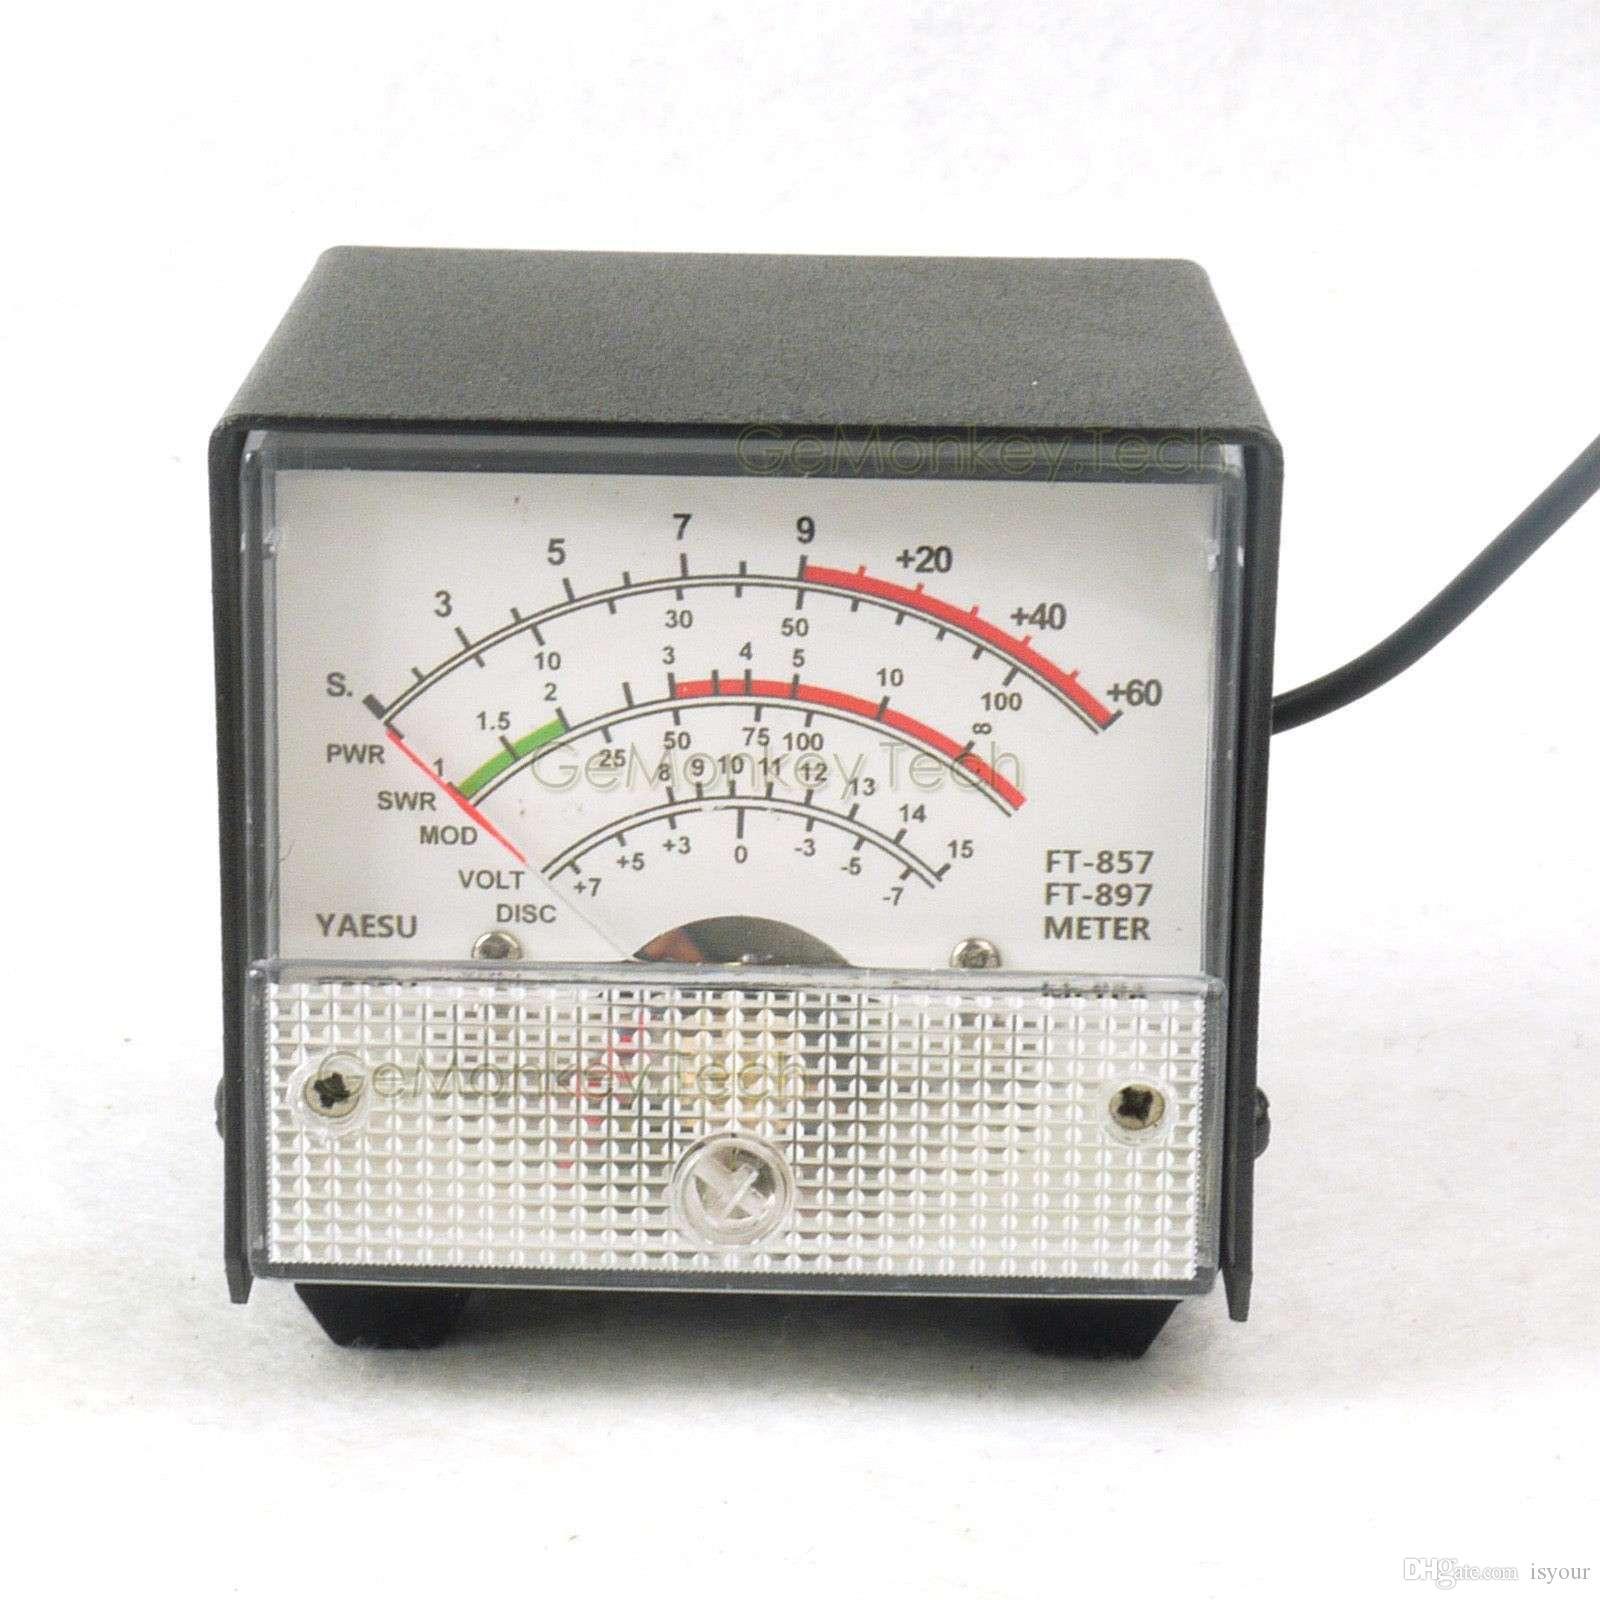 Freeshipping External S meter/ SWR / Power Meter Receive display meter For Yaesu FT-857/FT-897 standing wave ratio meter white